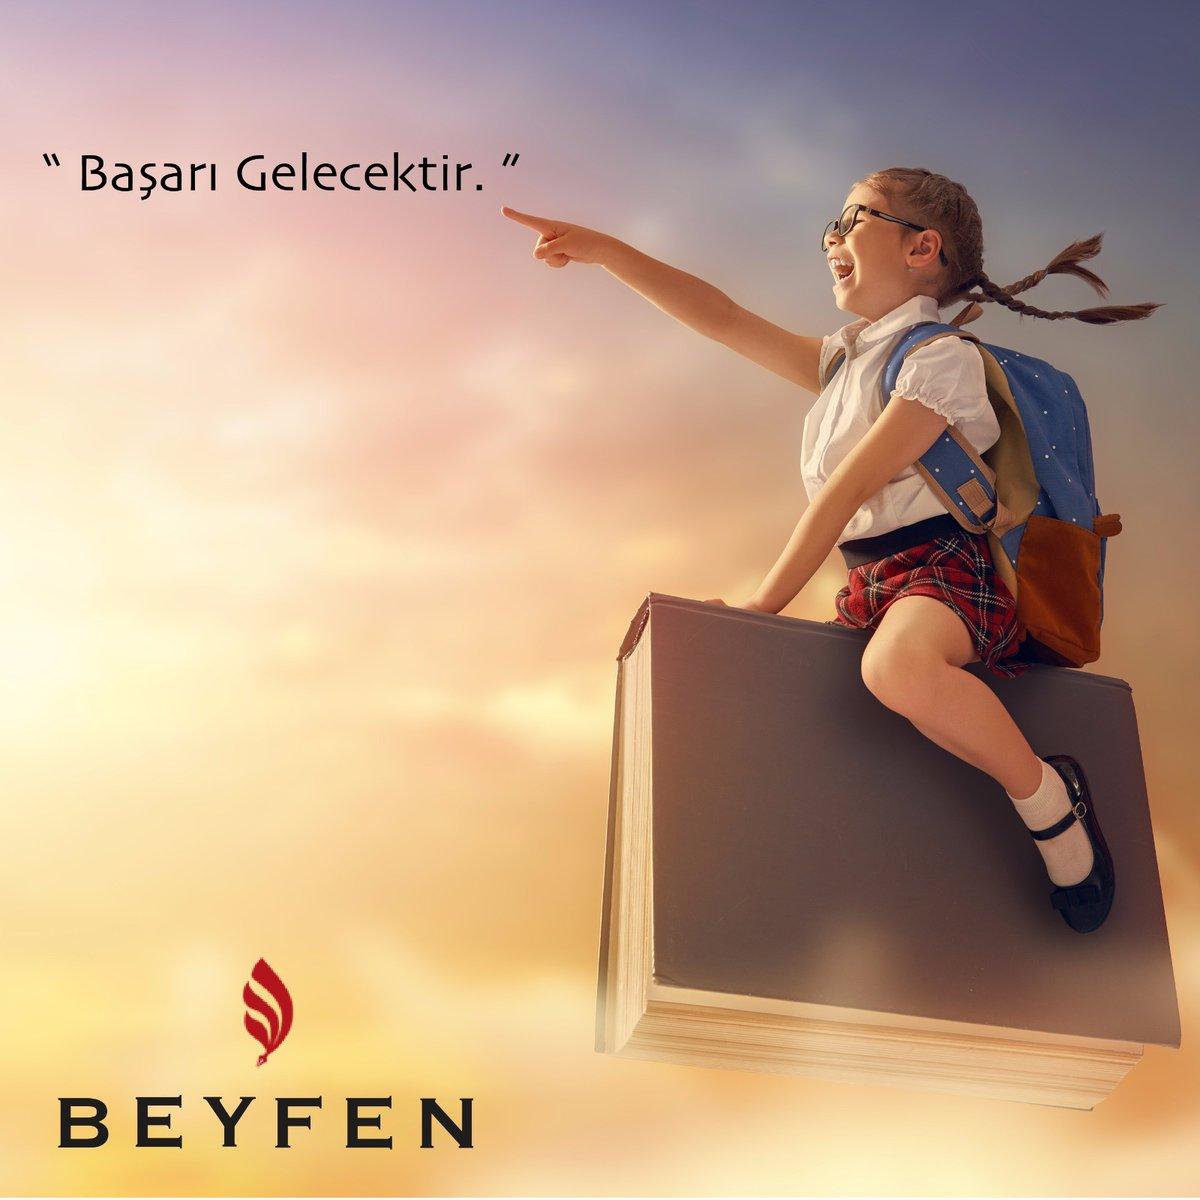 beyfen-kolejleri